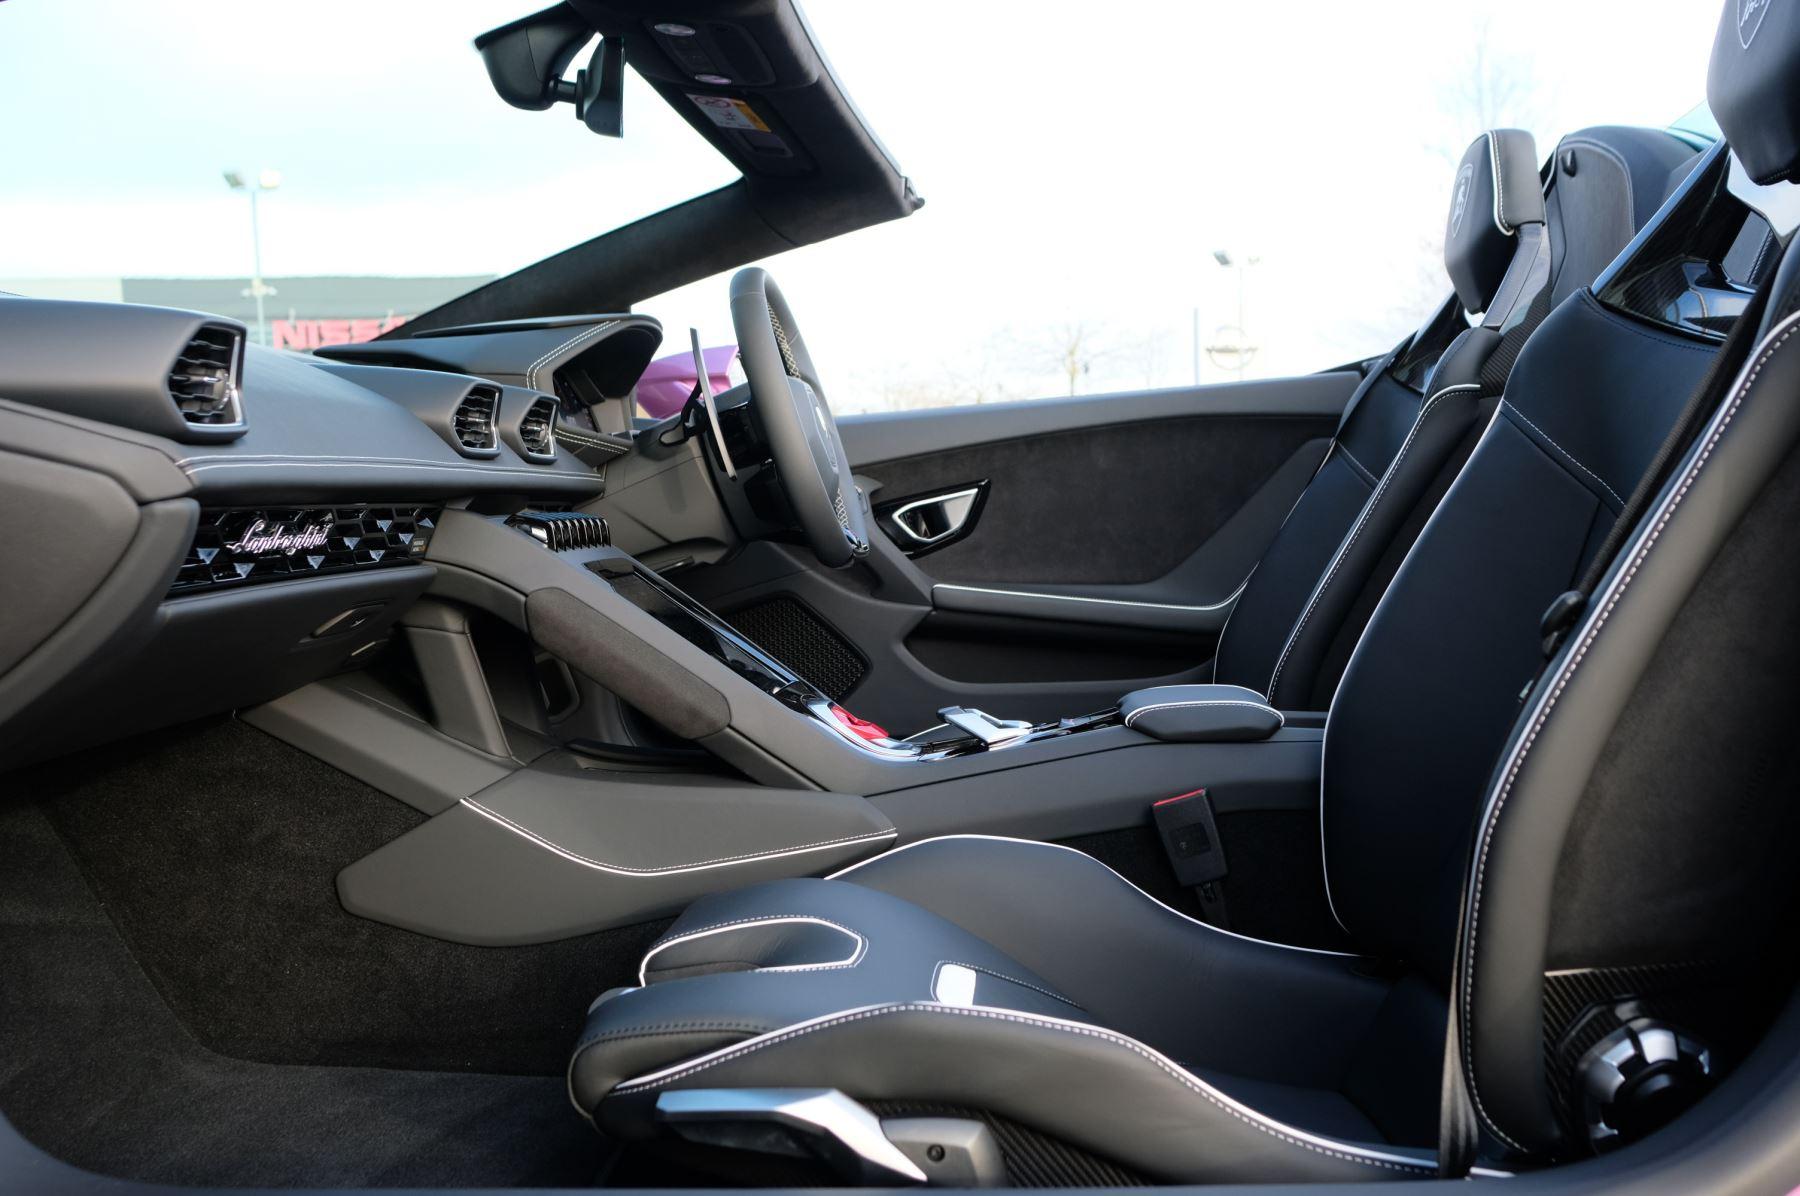 Lamborghini Huracan EVO Spyder 5.2 V10 640 2dr Auto AWD image 6